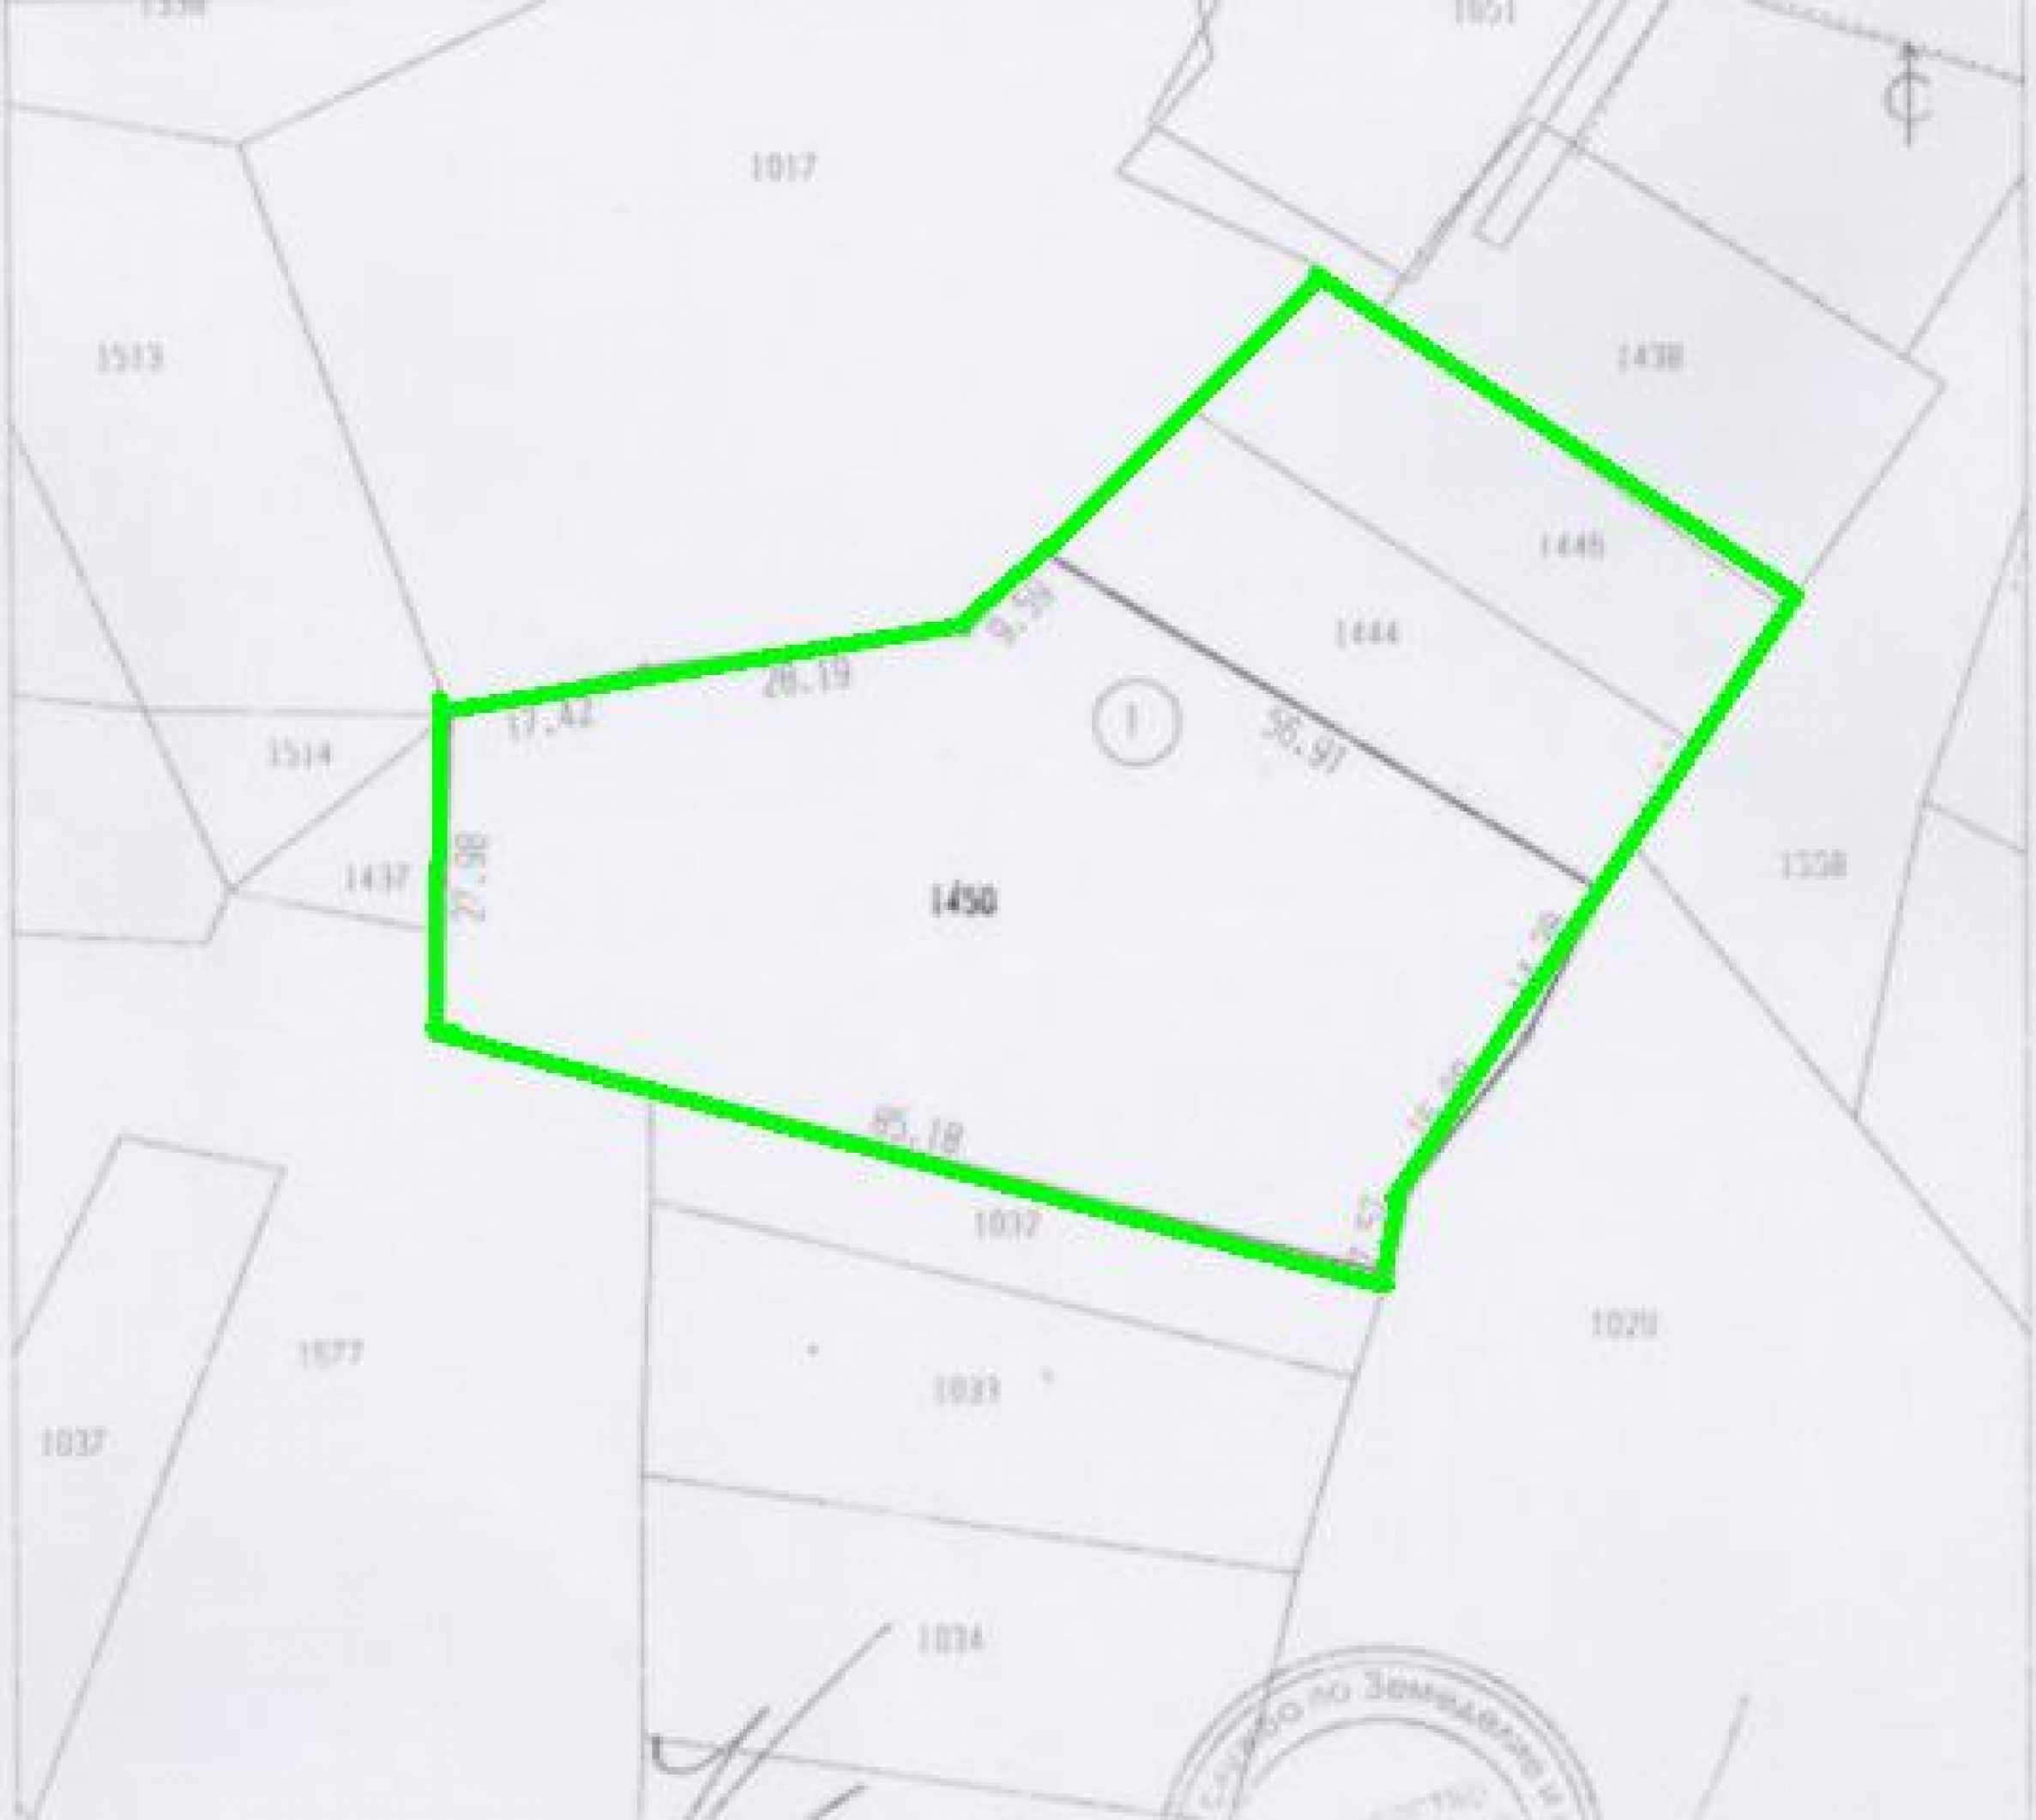 Drei benachbarte Grundstücke in Rudartsi 18